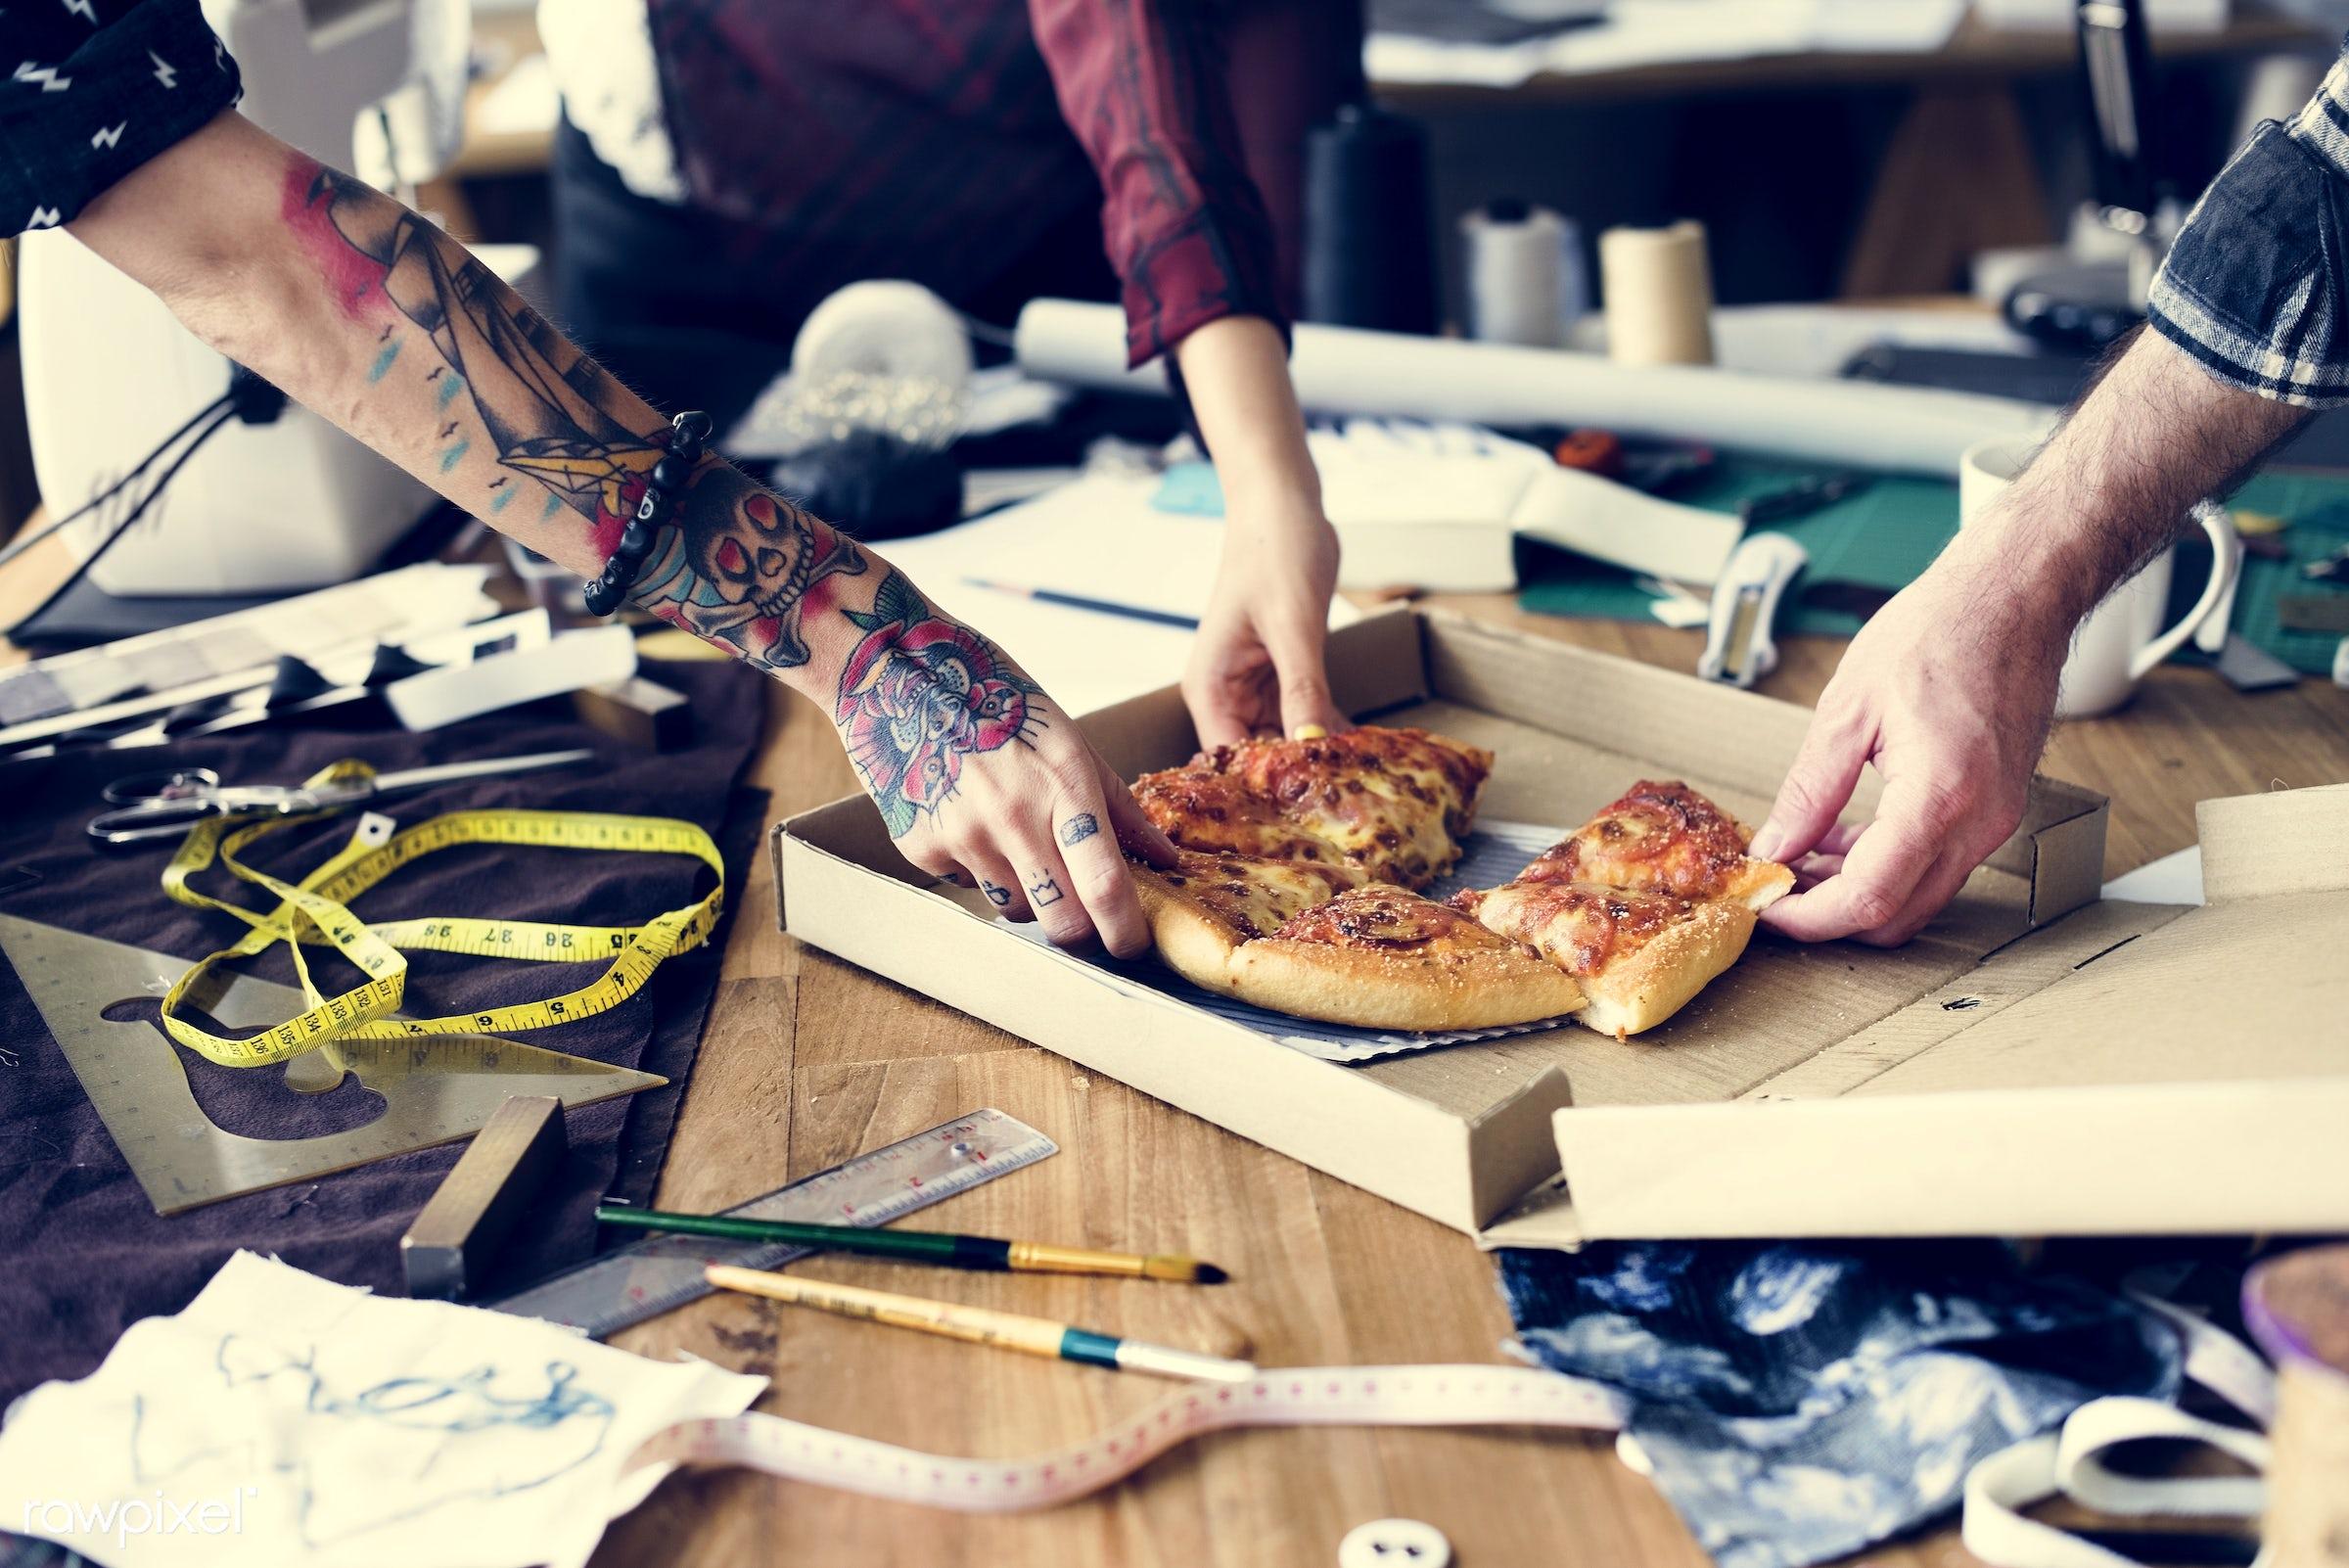 studio, manufacturing, craft, designing, profession, busy, equipment, production, break, teamwork, inspiration, lifestyle,...